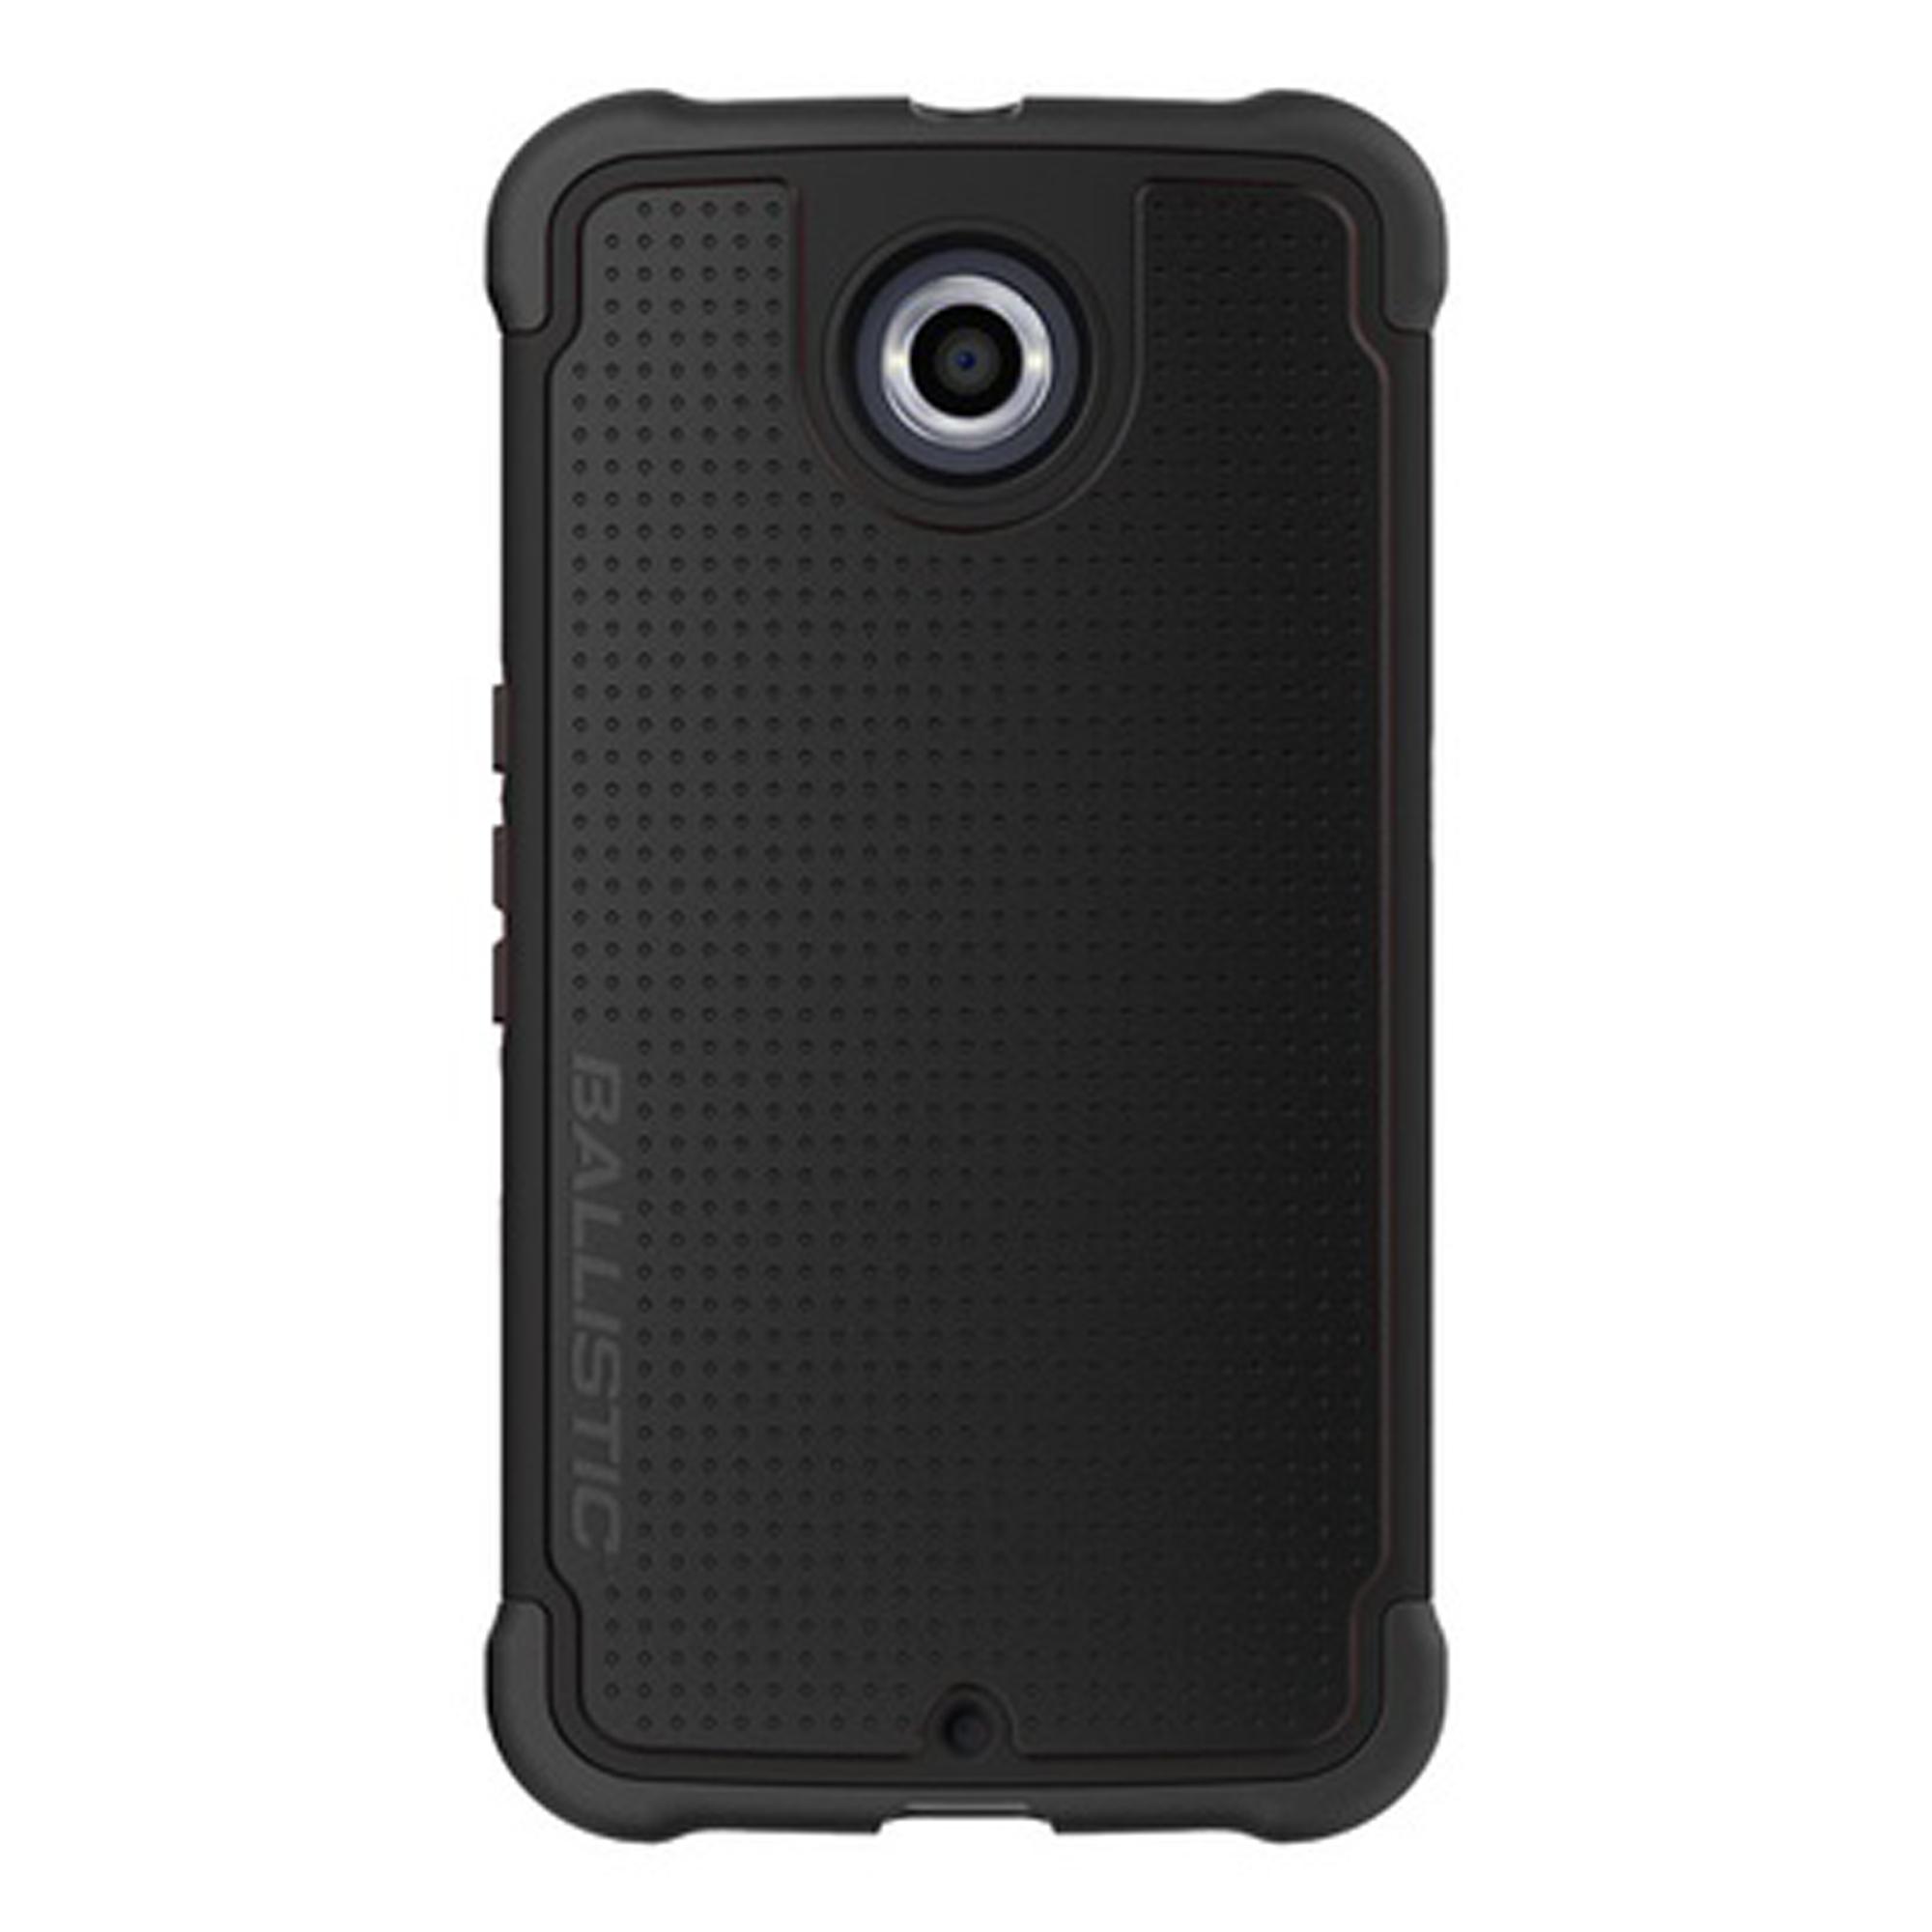 Ballistic Corp Nexus 6 By Motorola Tough Jacket Case - Re...